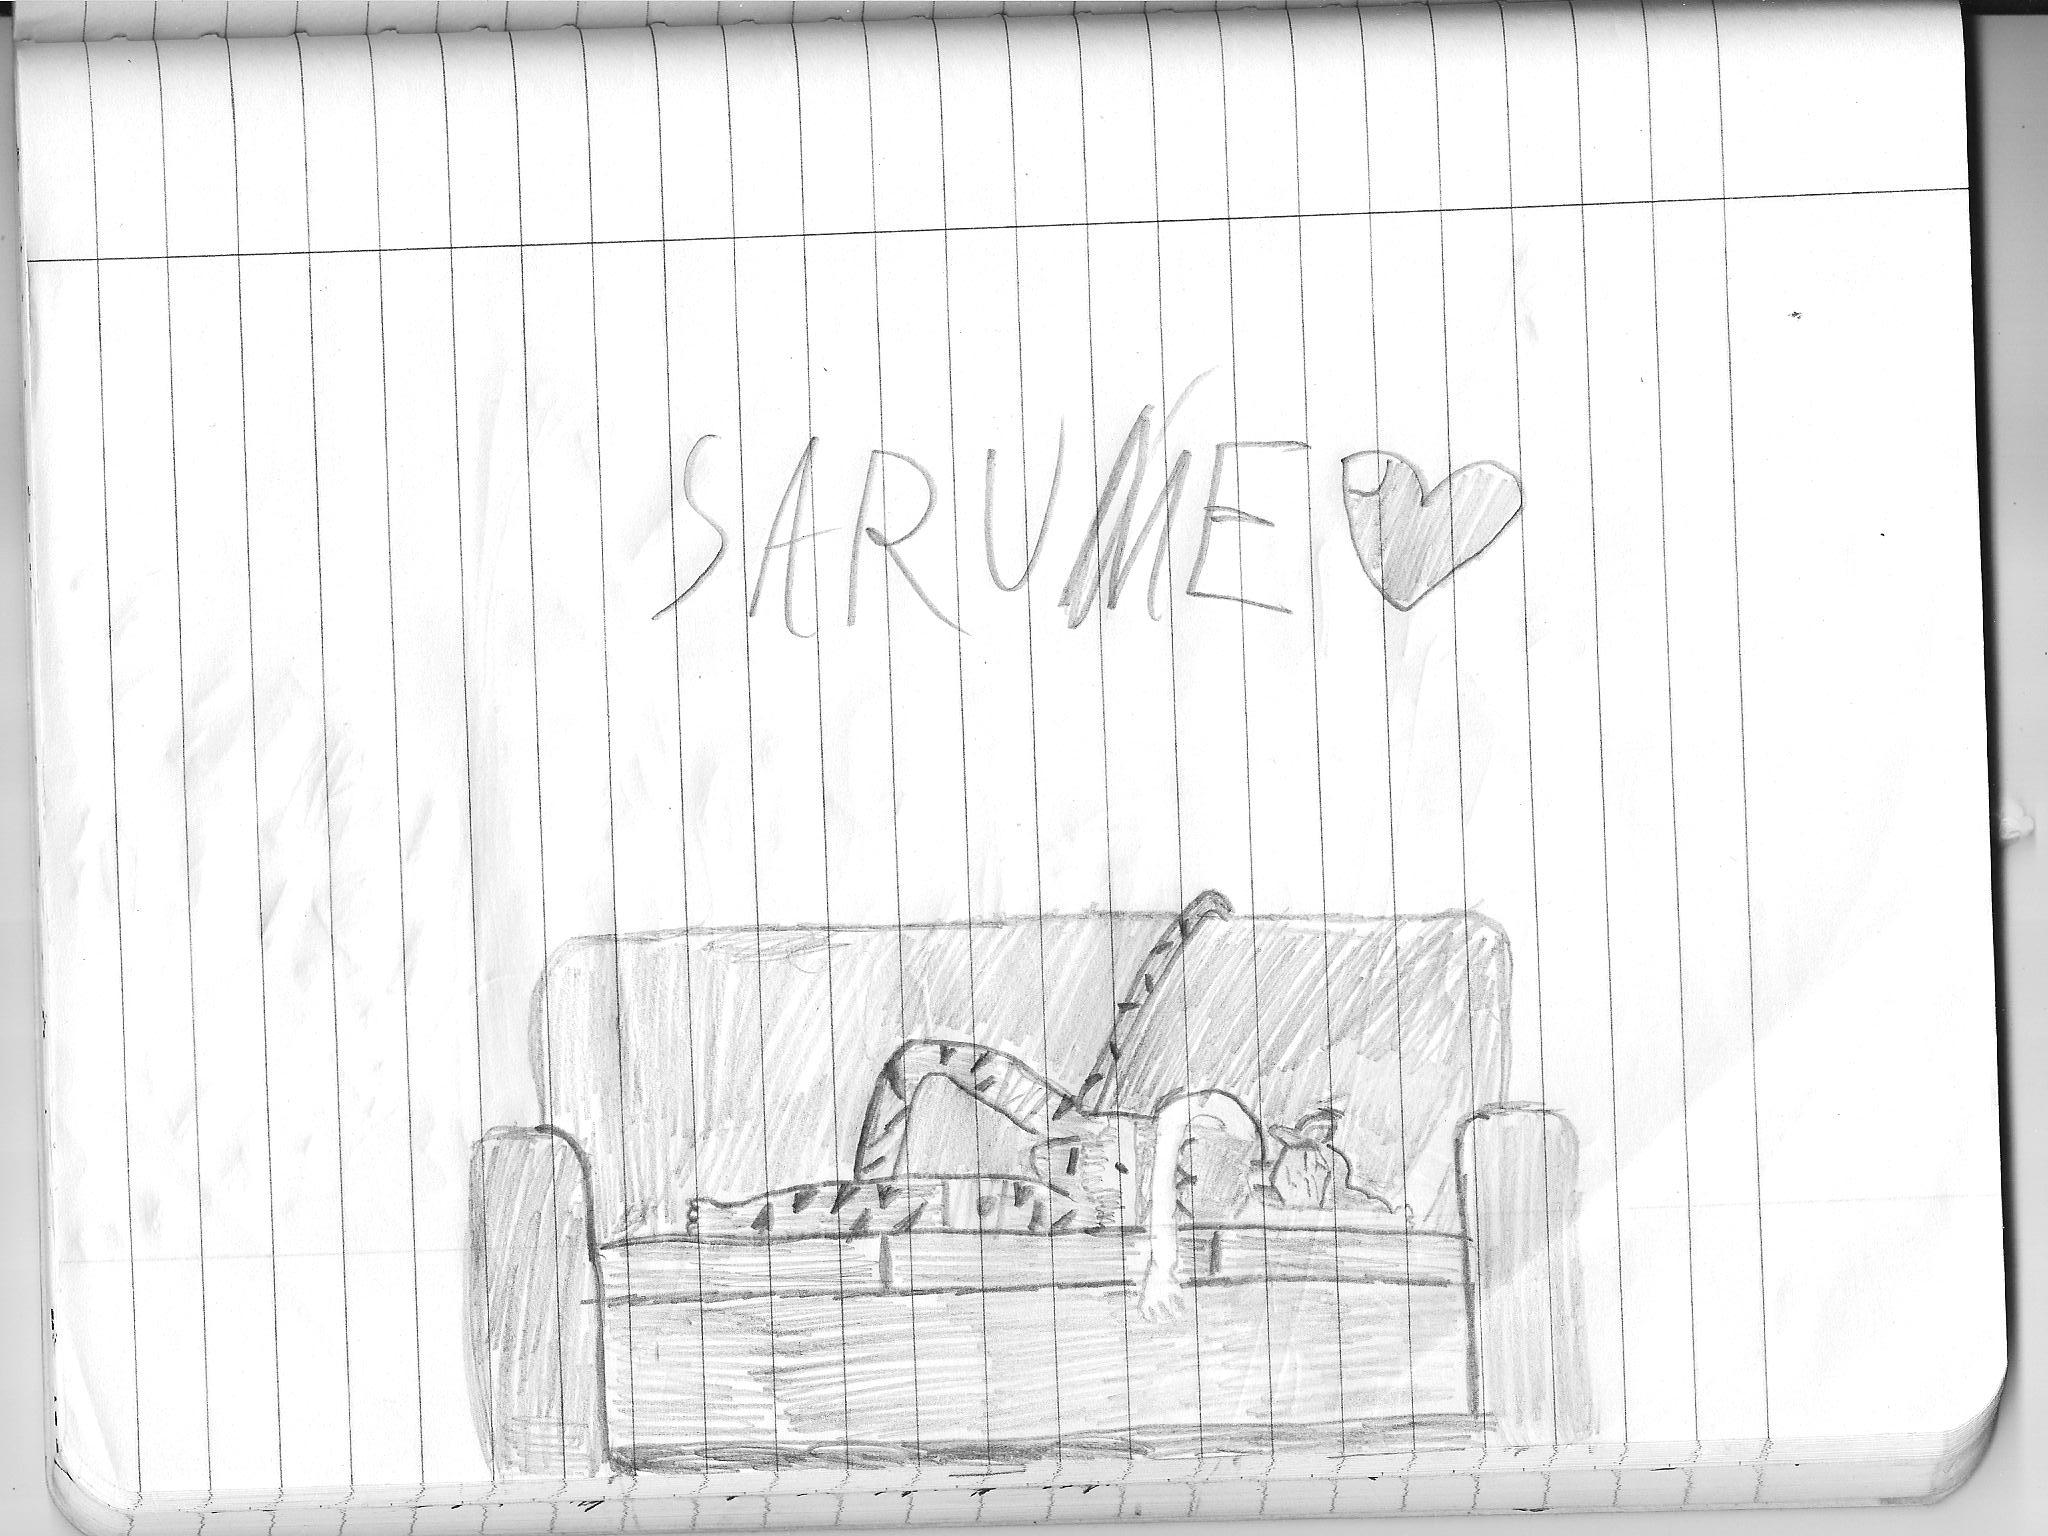 sarume asleep on couch